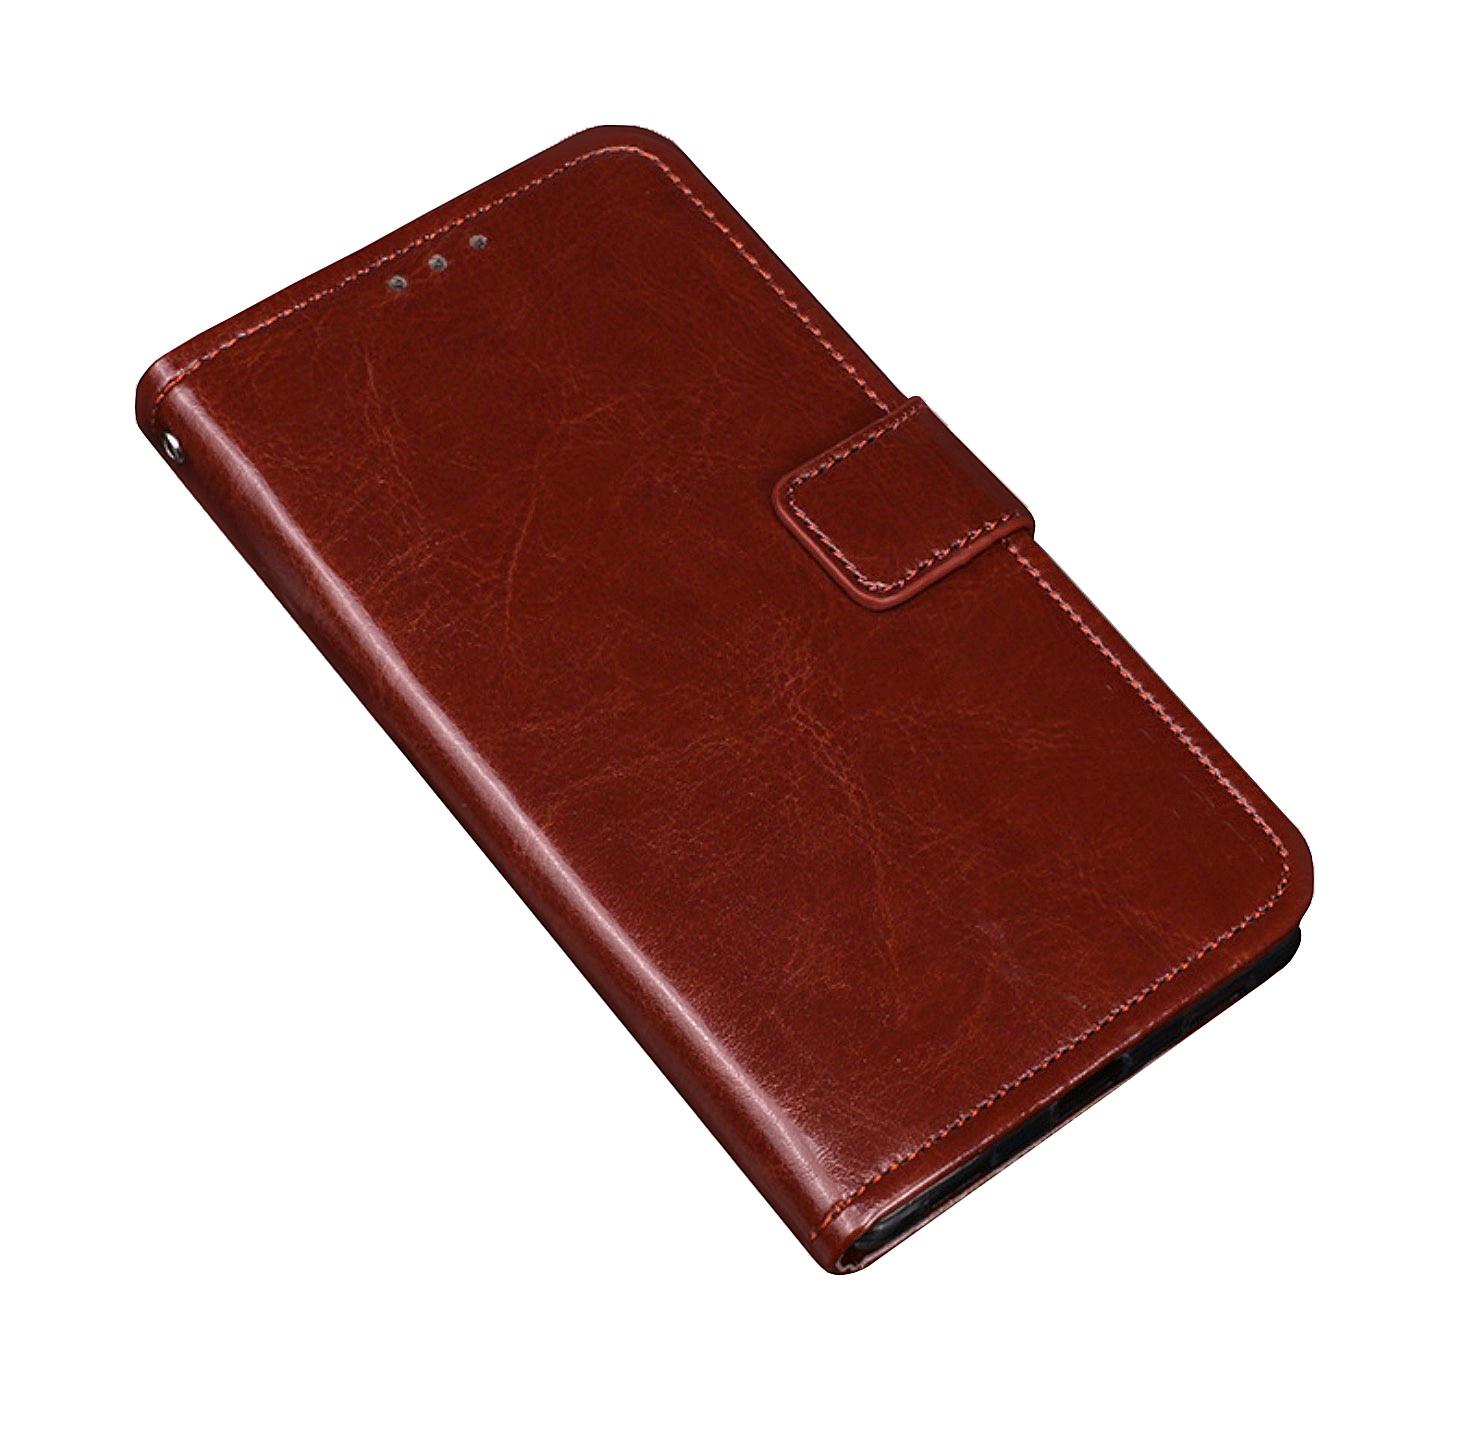 Чехол-книжка MyPads для OPPO A1k / realme C2 2/16GB с мульти-подставкой застёжкой и визитницей коричневый